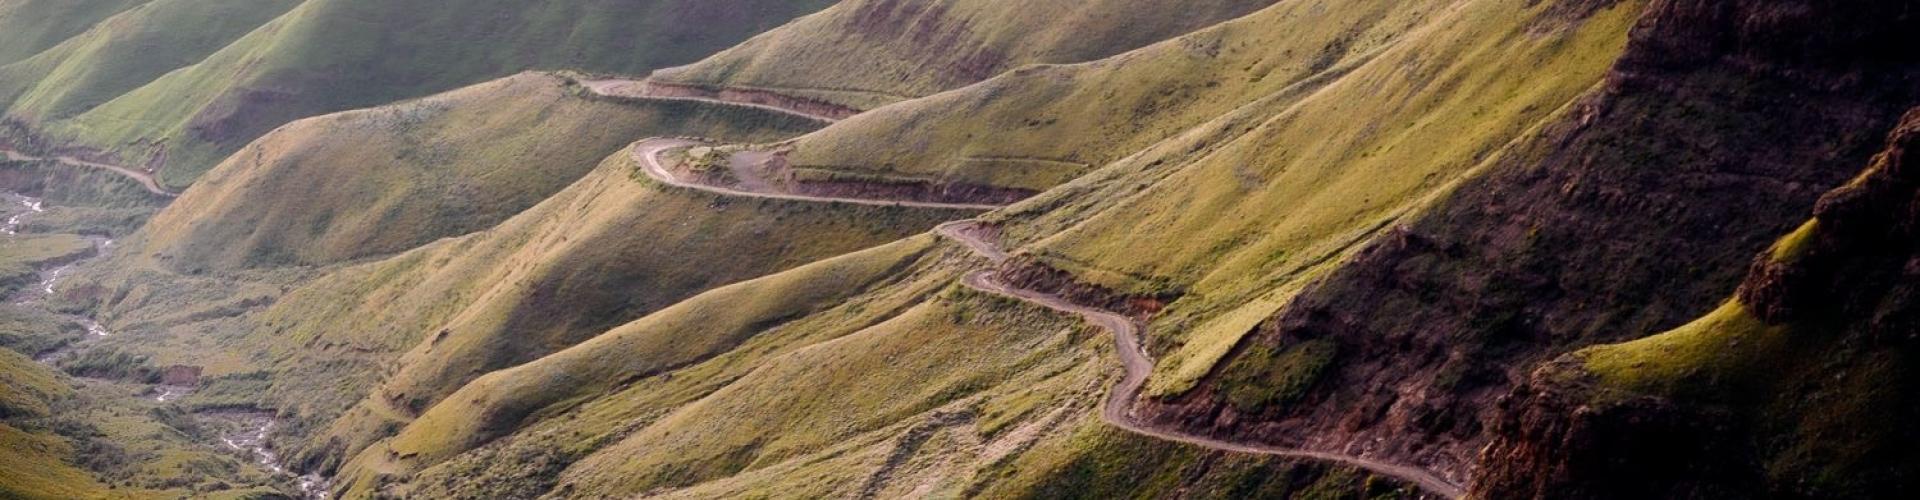 bergpassen-en-bergrouten-in-zuid-afrika-in-sanipas